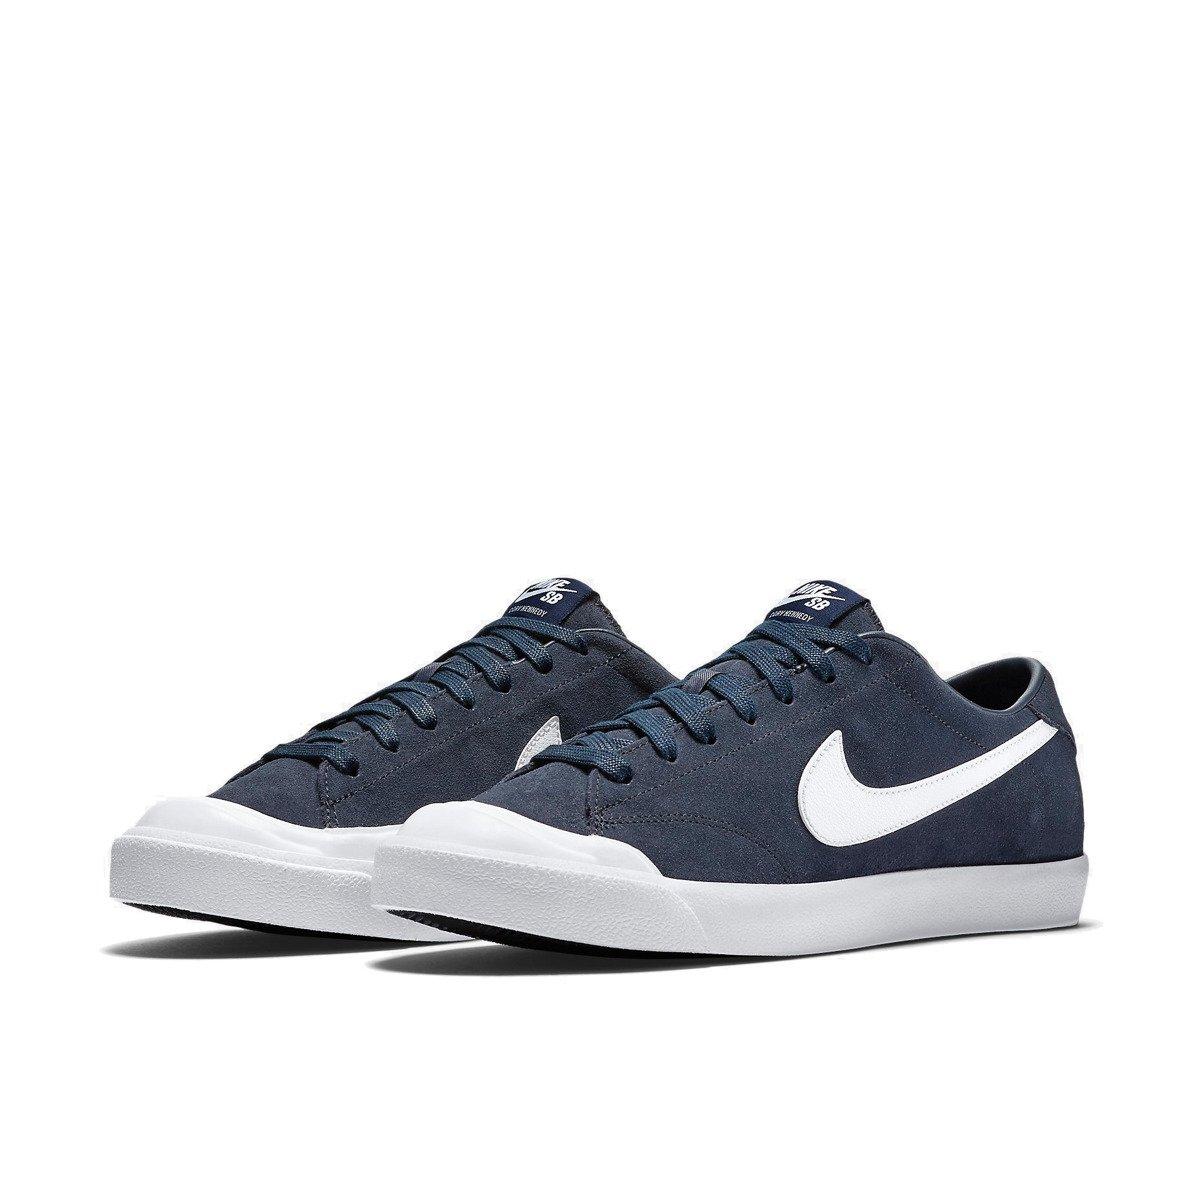 aa5b3f2e4feff Buty Nike SB Air Zoom All Court CK Obsidian/white navy | Shoes ...